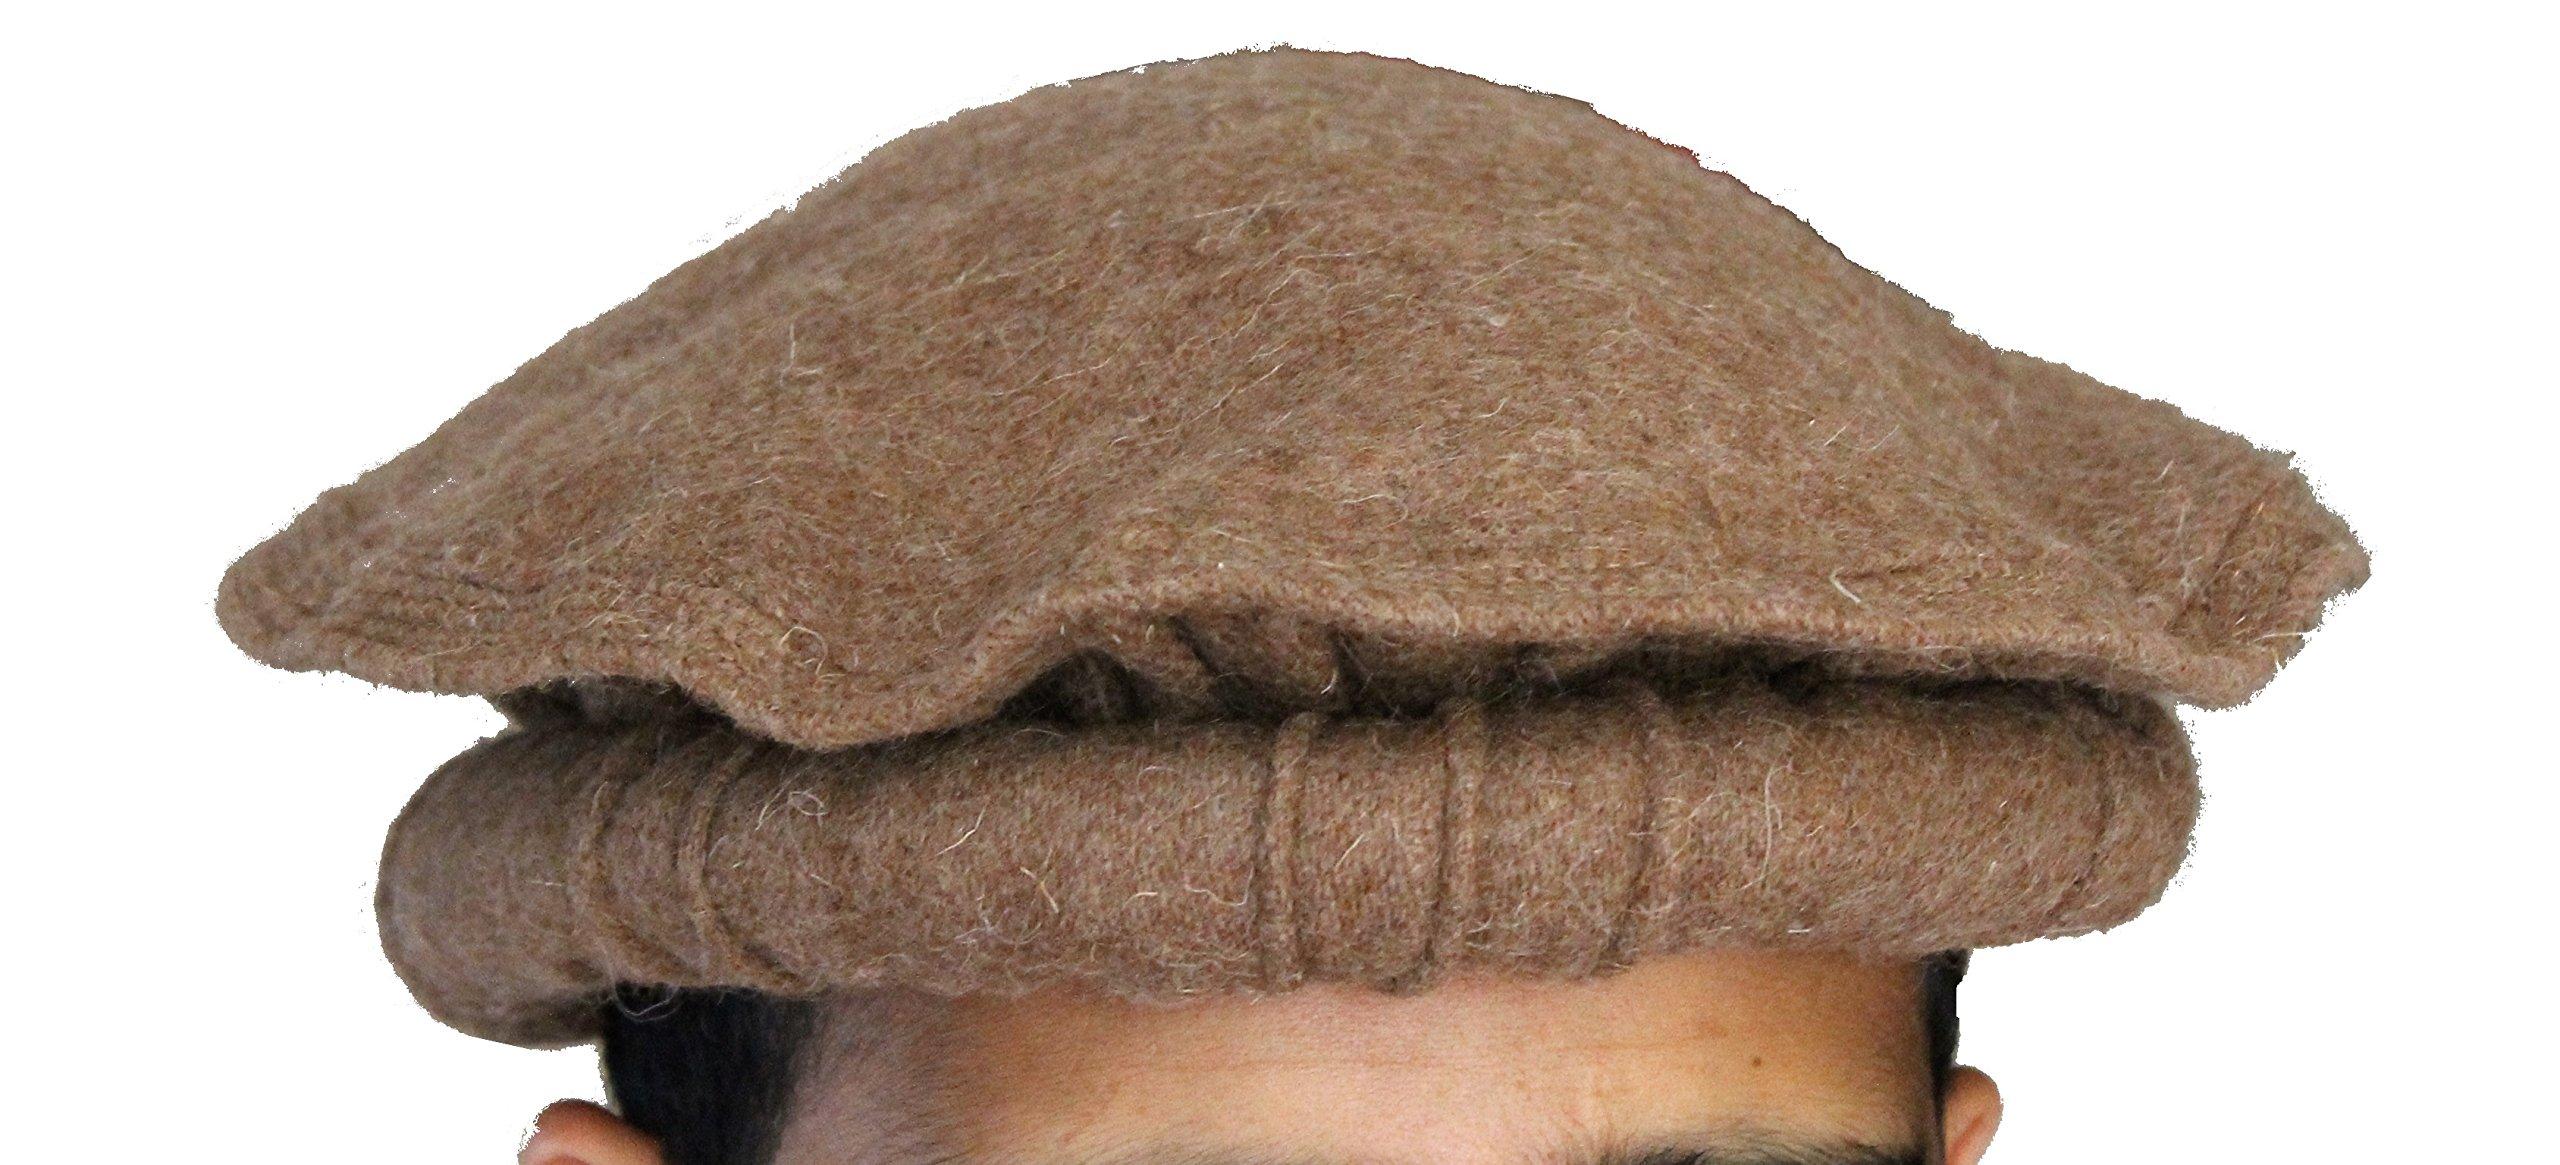 Galleon - 100% Wool Handmade Chitrali Cap   Afghani Pakol   Hat From  Pakistan   Afghanistan (Khaki) c909d48c78f